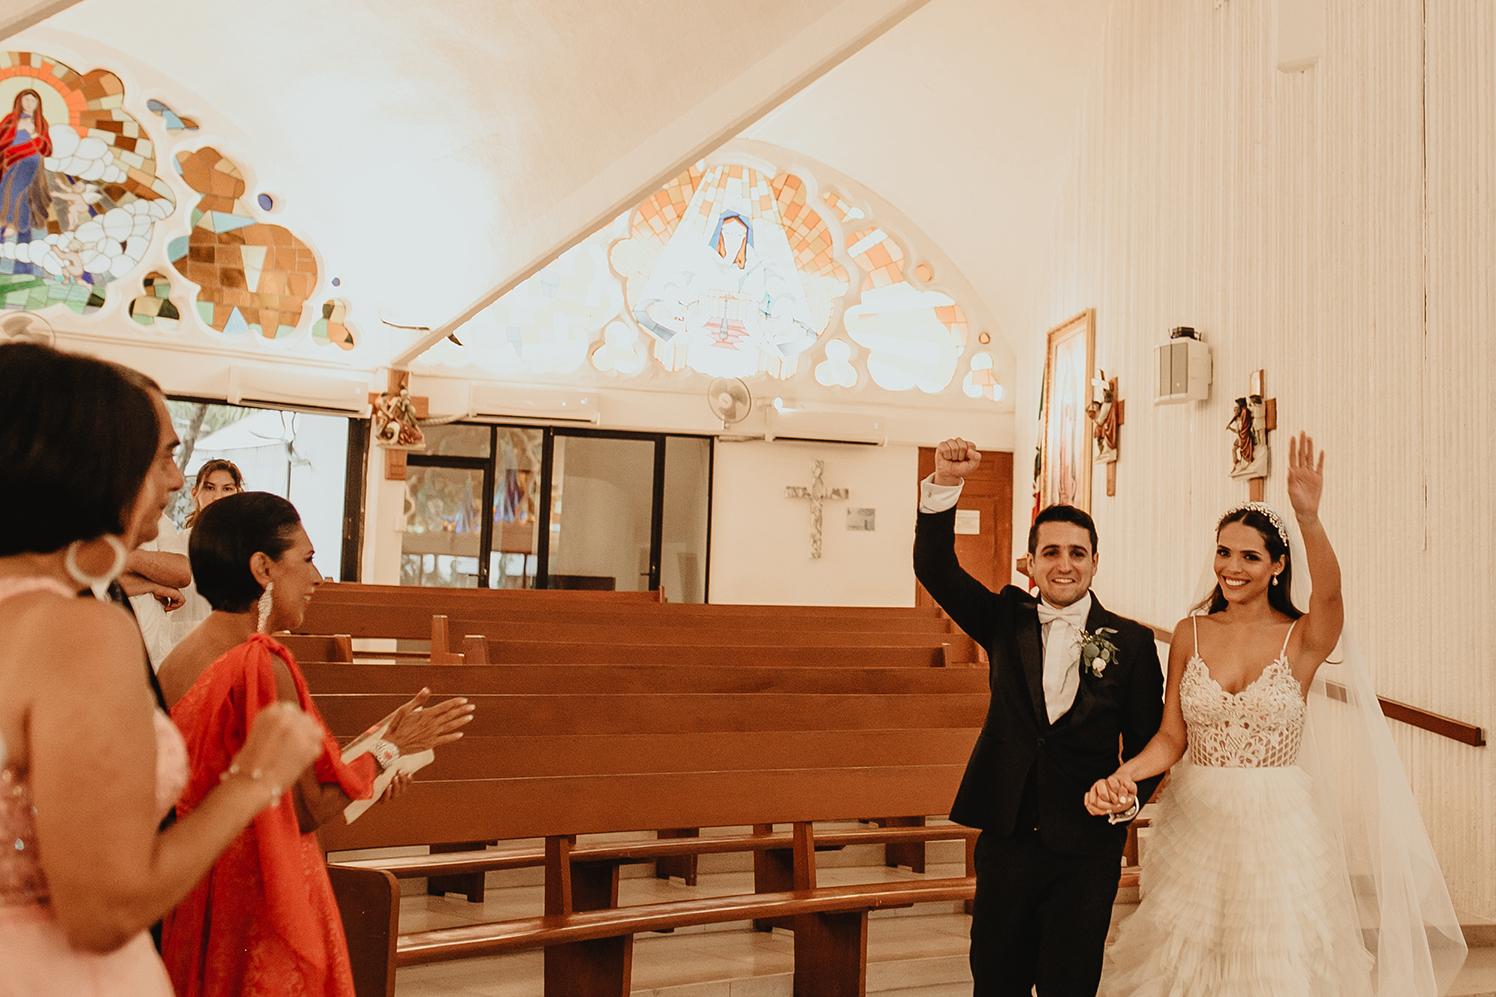 0782R&F__WeddingDestination_Weddingmerida_BodaMexico_FotografoDeBodas_FabrizioSimoneenFotografo.jpg